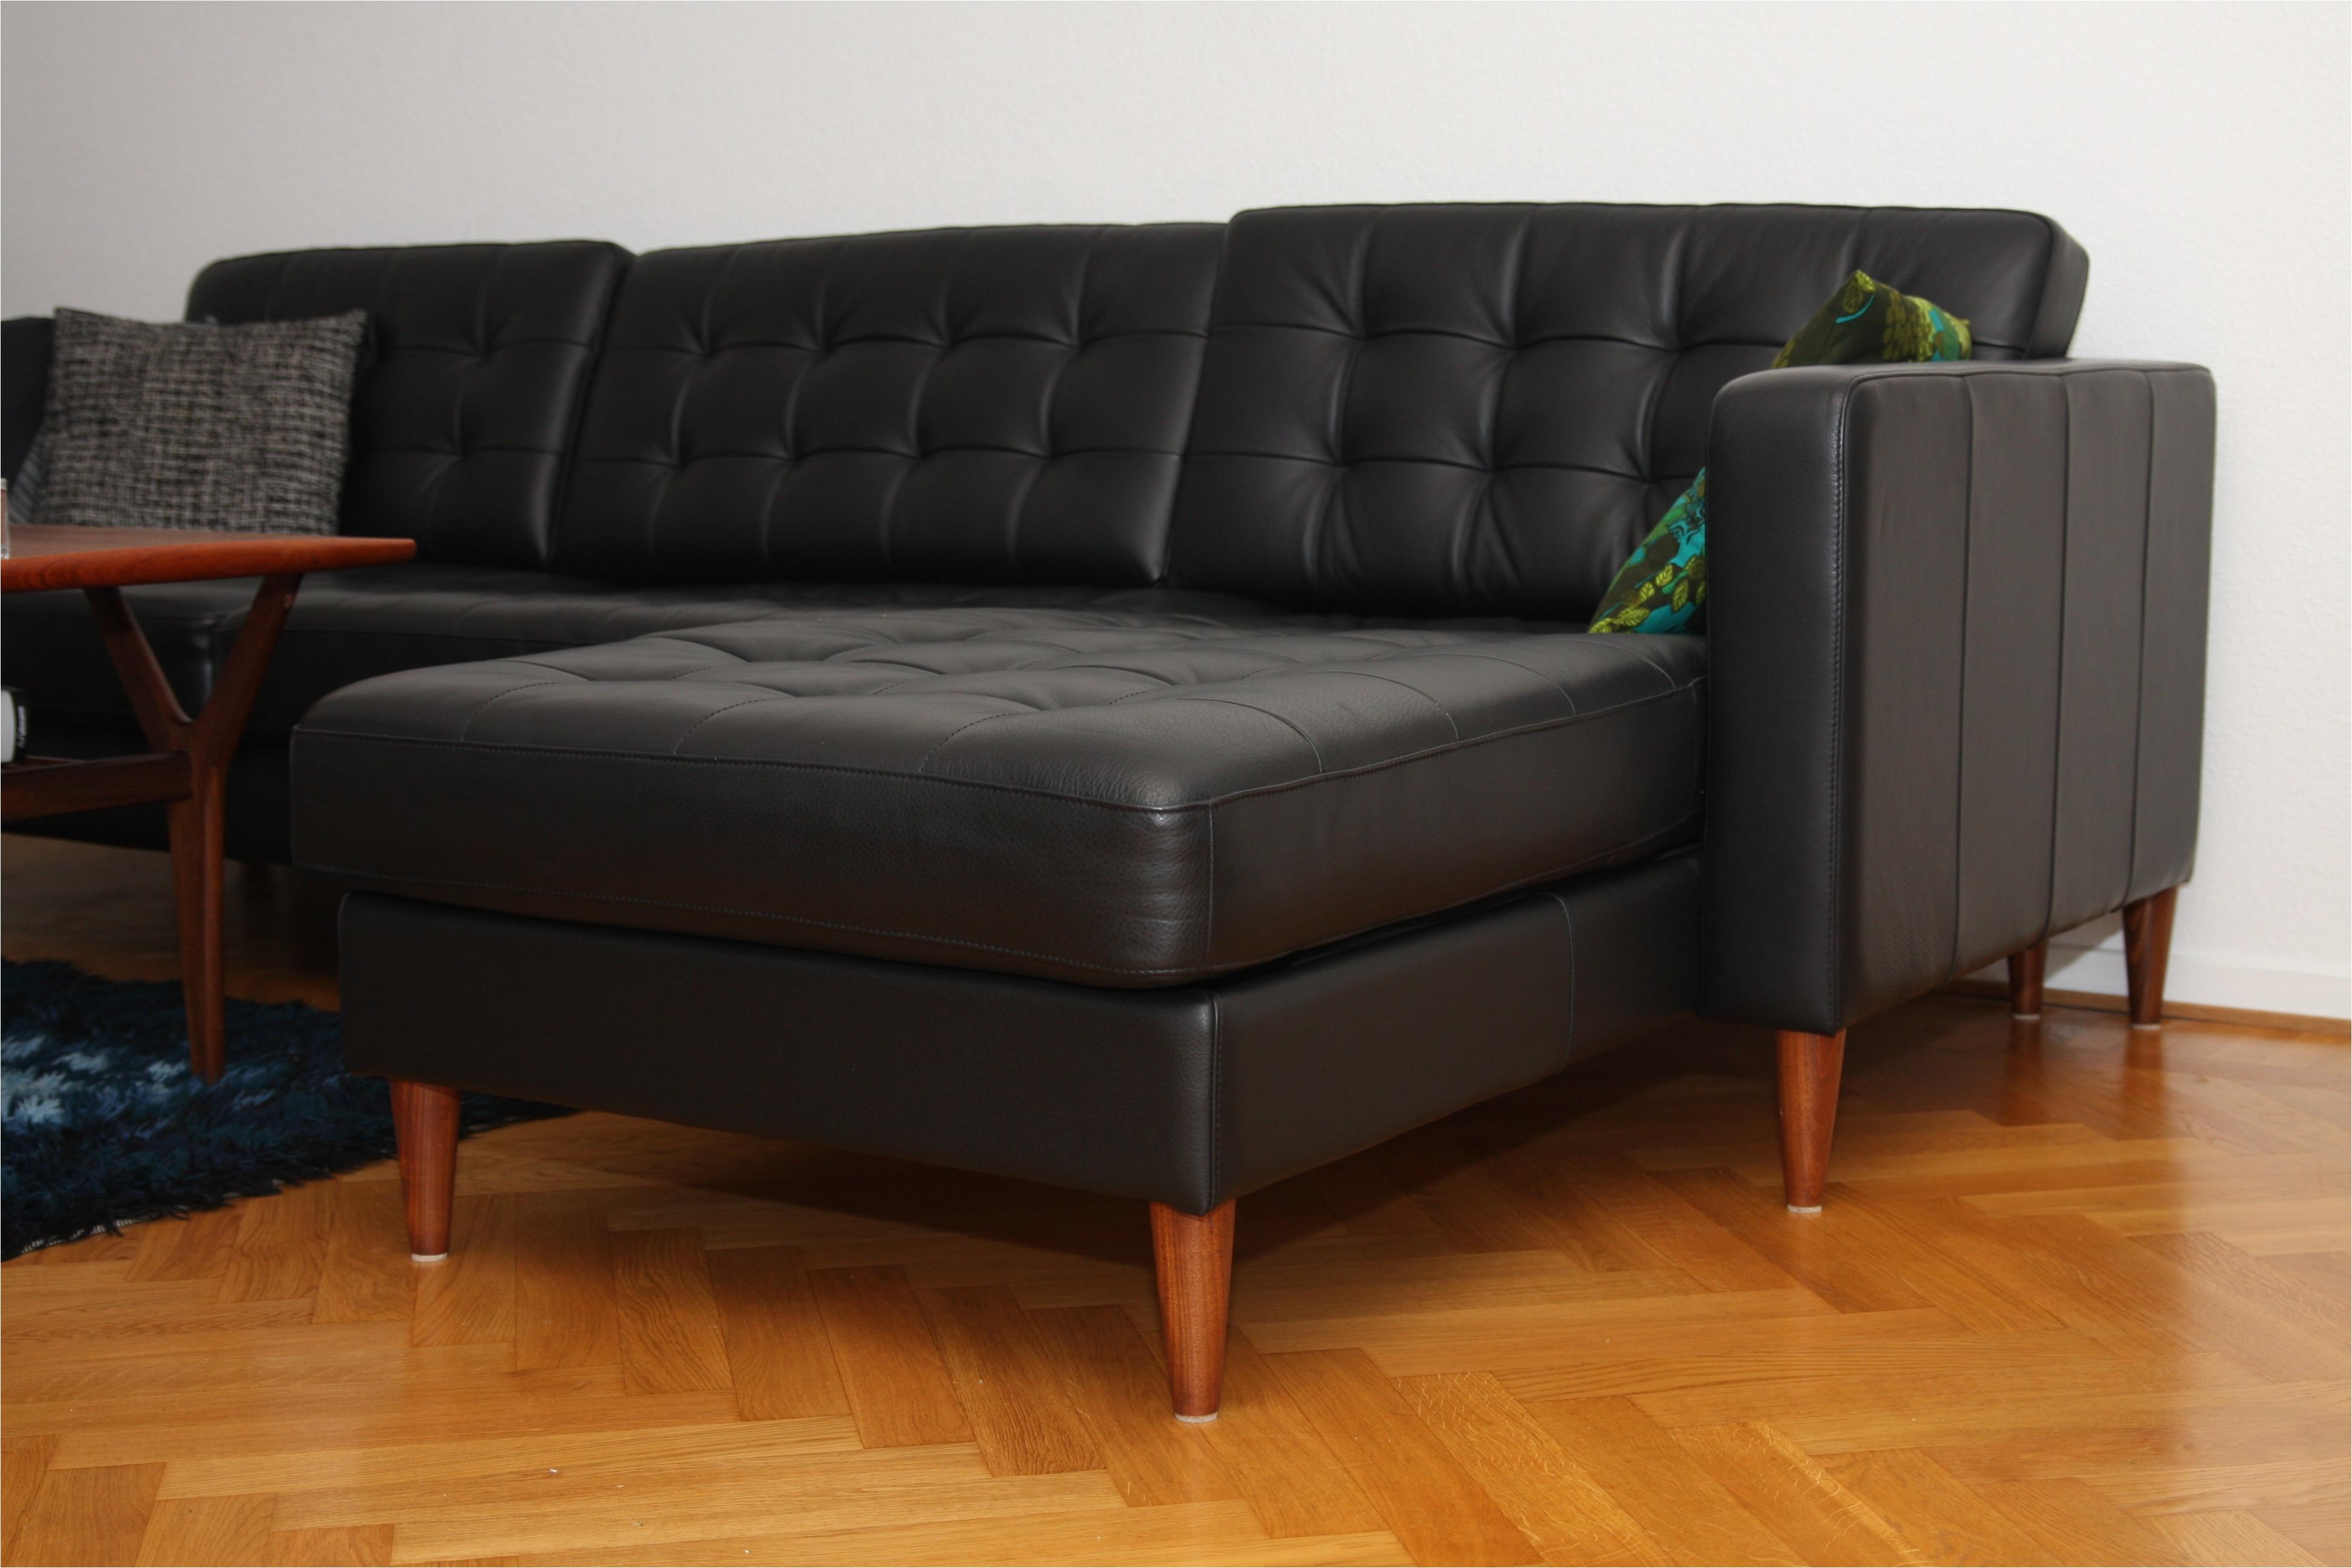 Ikea Friheten Sleeper sofa Review Ikea Schlafsofa Friheten Luxus Amazing Ikea Karlstad sofa Leather 8